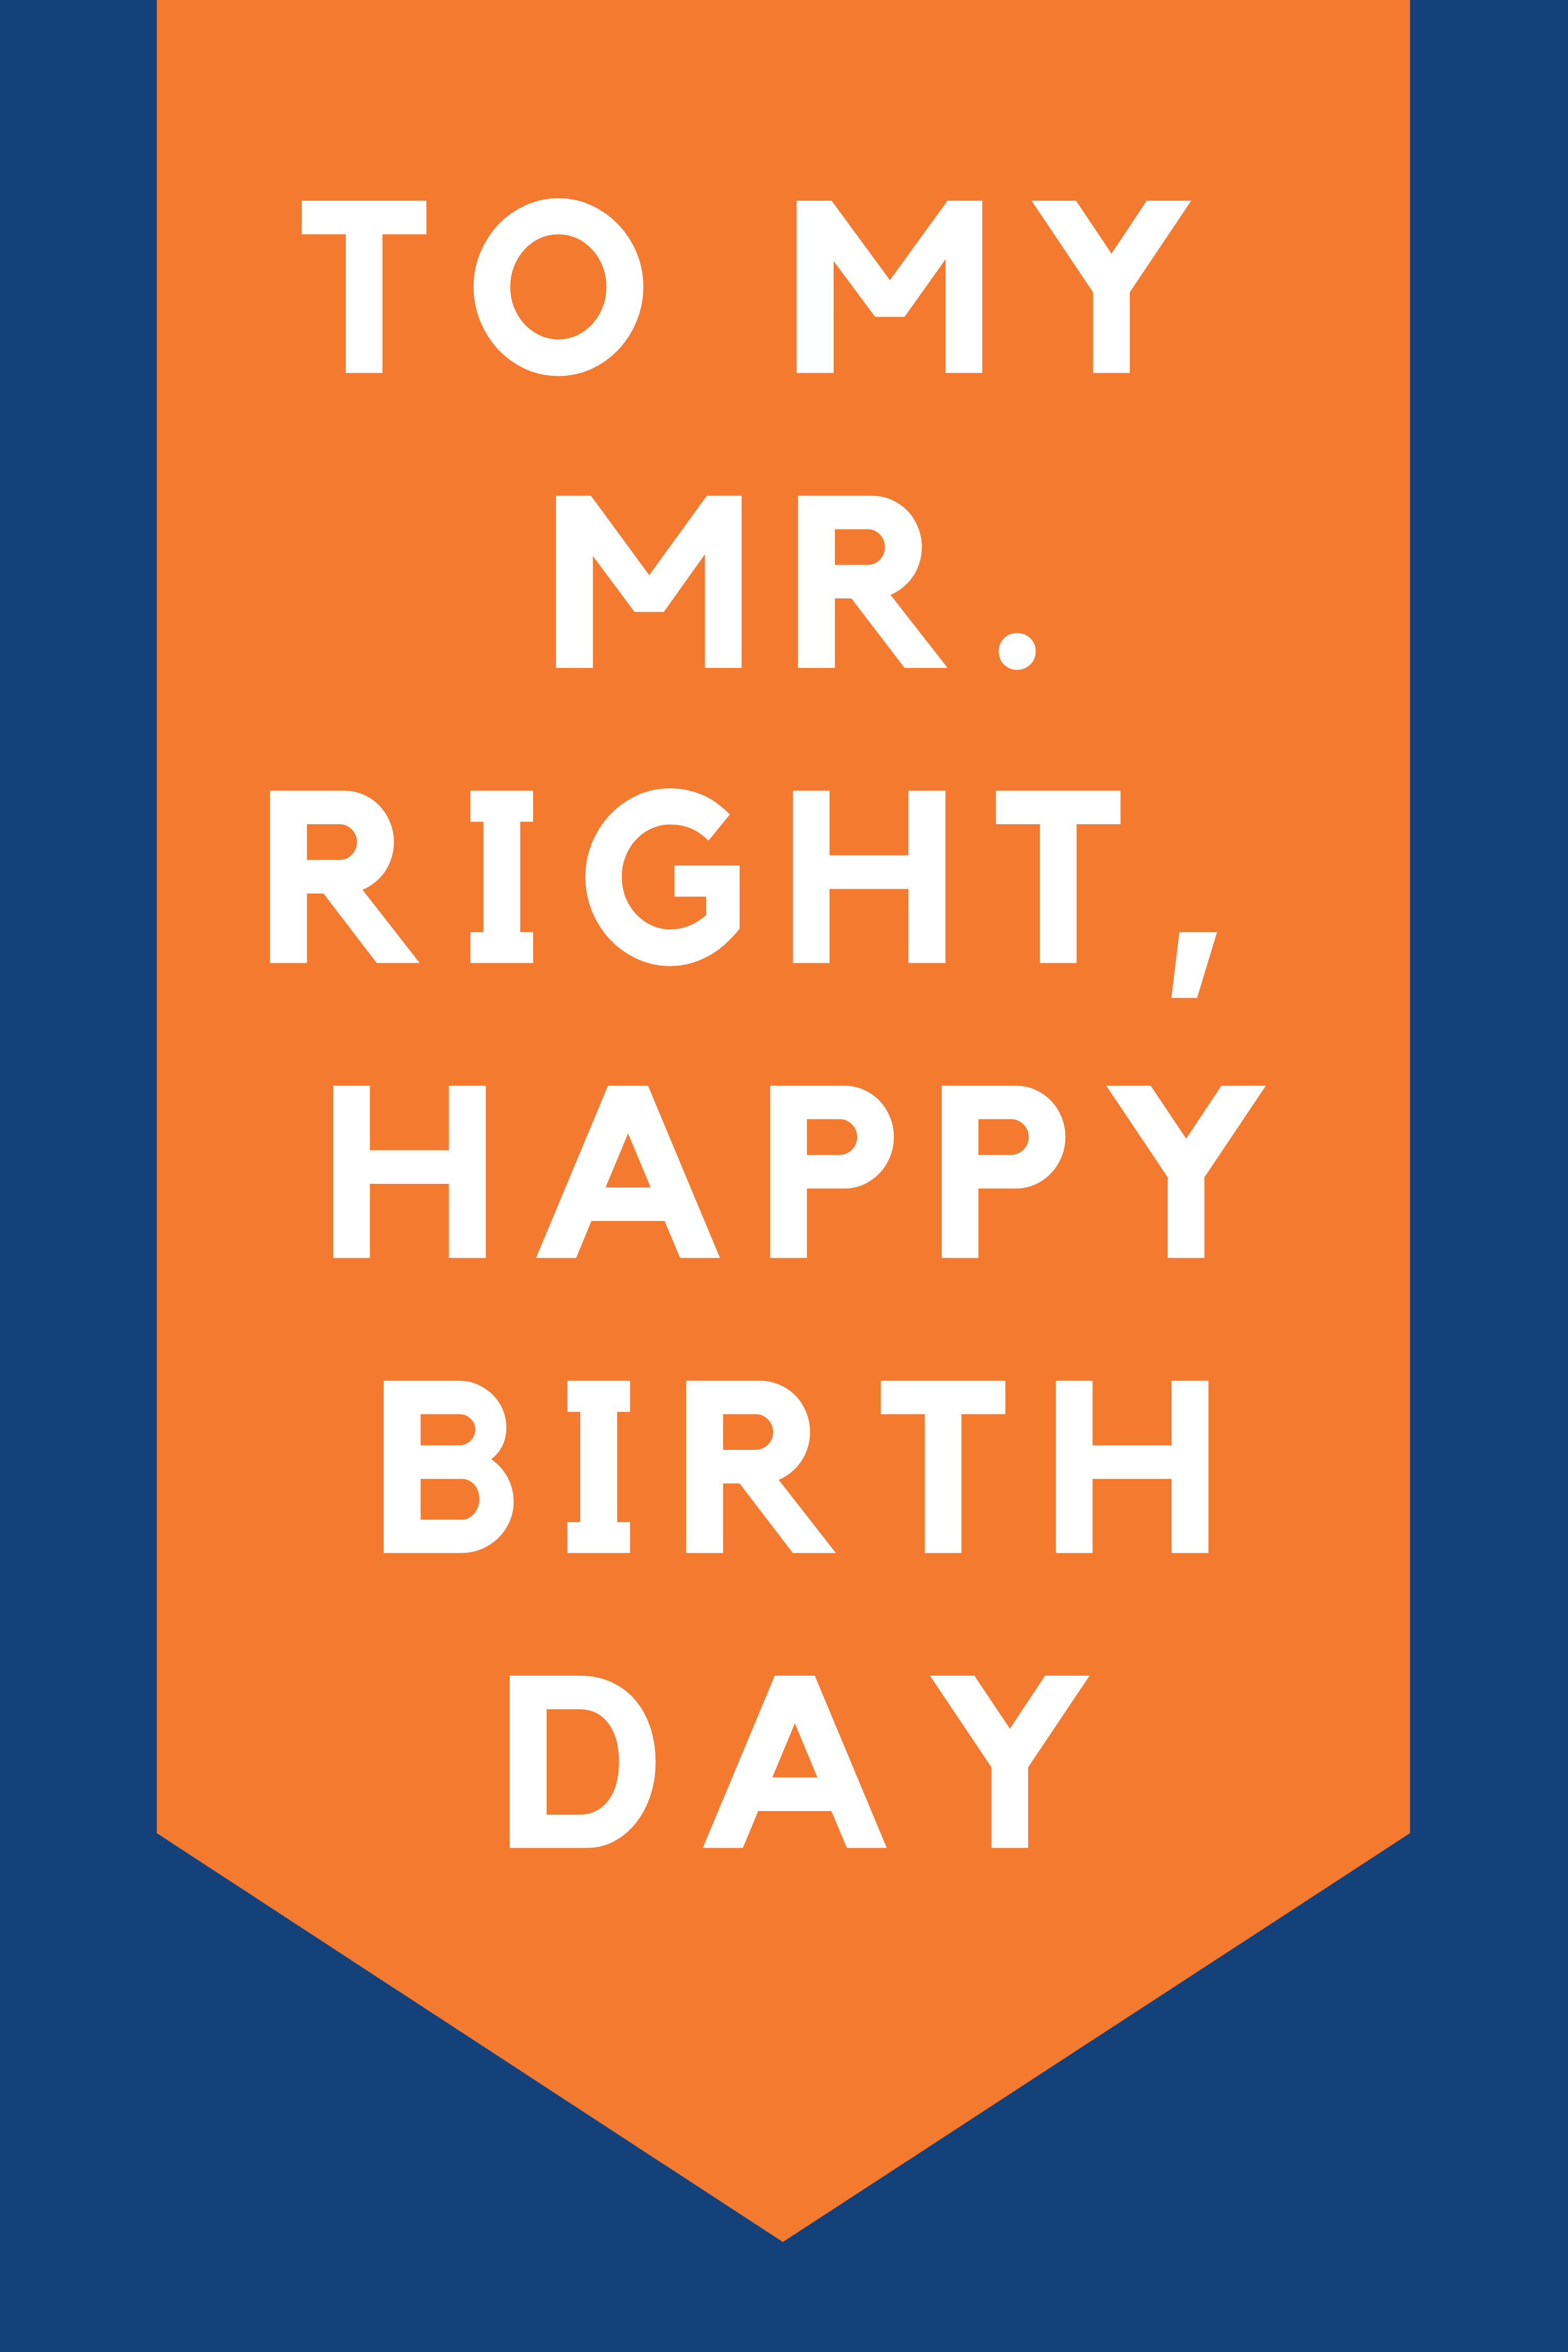 Happy Birthday Quotes to celebrate your man